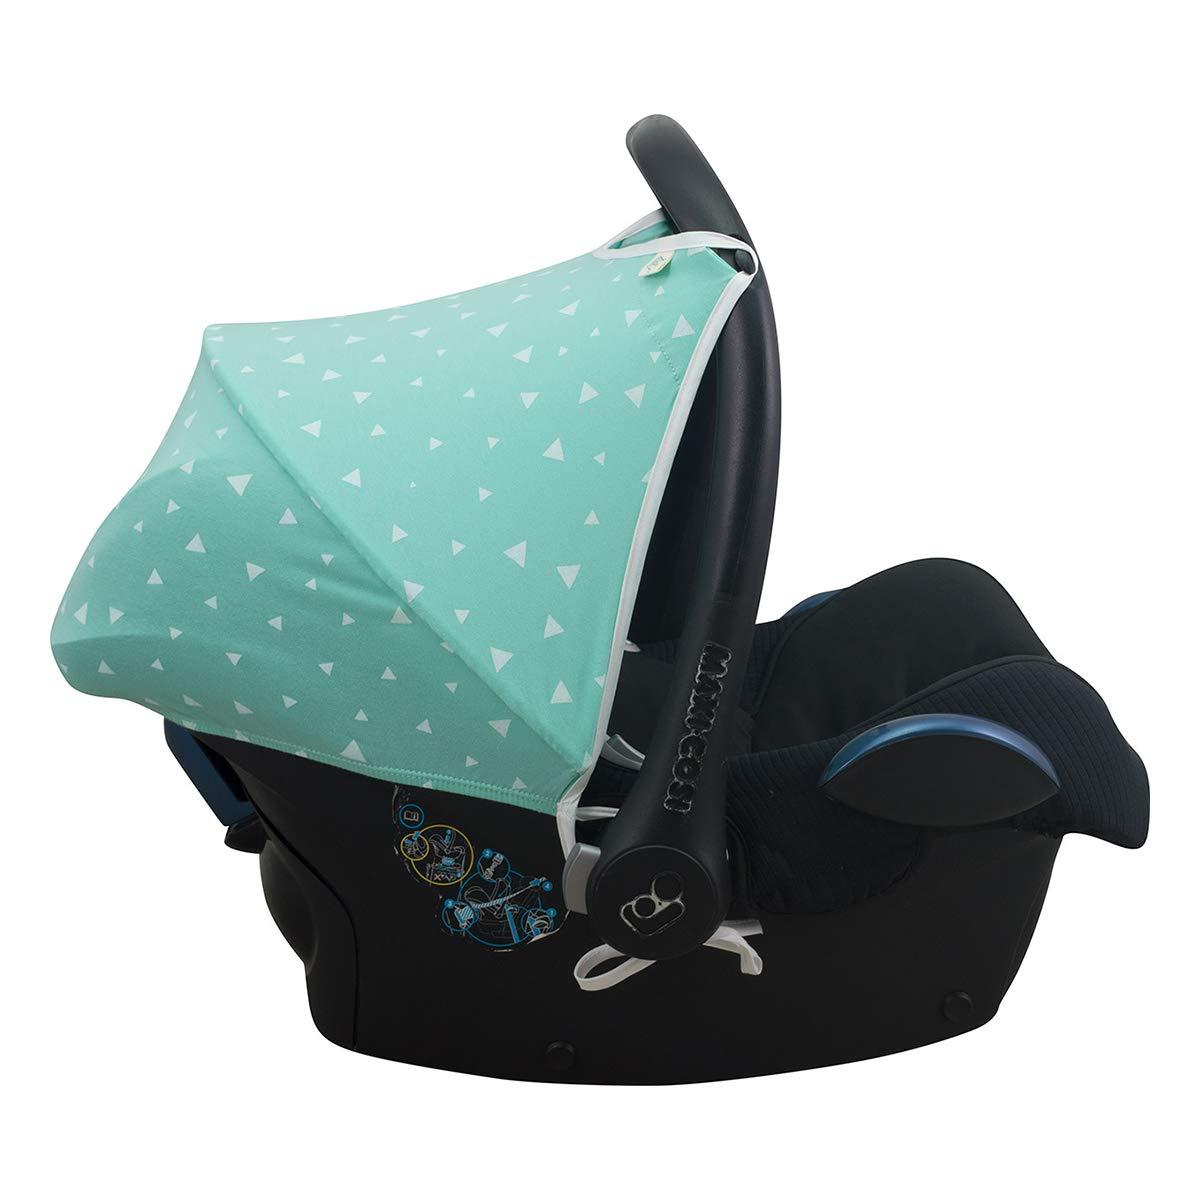 Black Series JANABEBE Hood Canopy for Maxi COSI Cabriofix and Maxi COSI Pebble